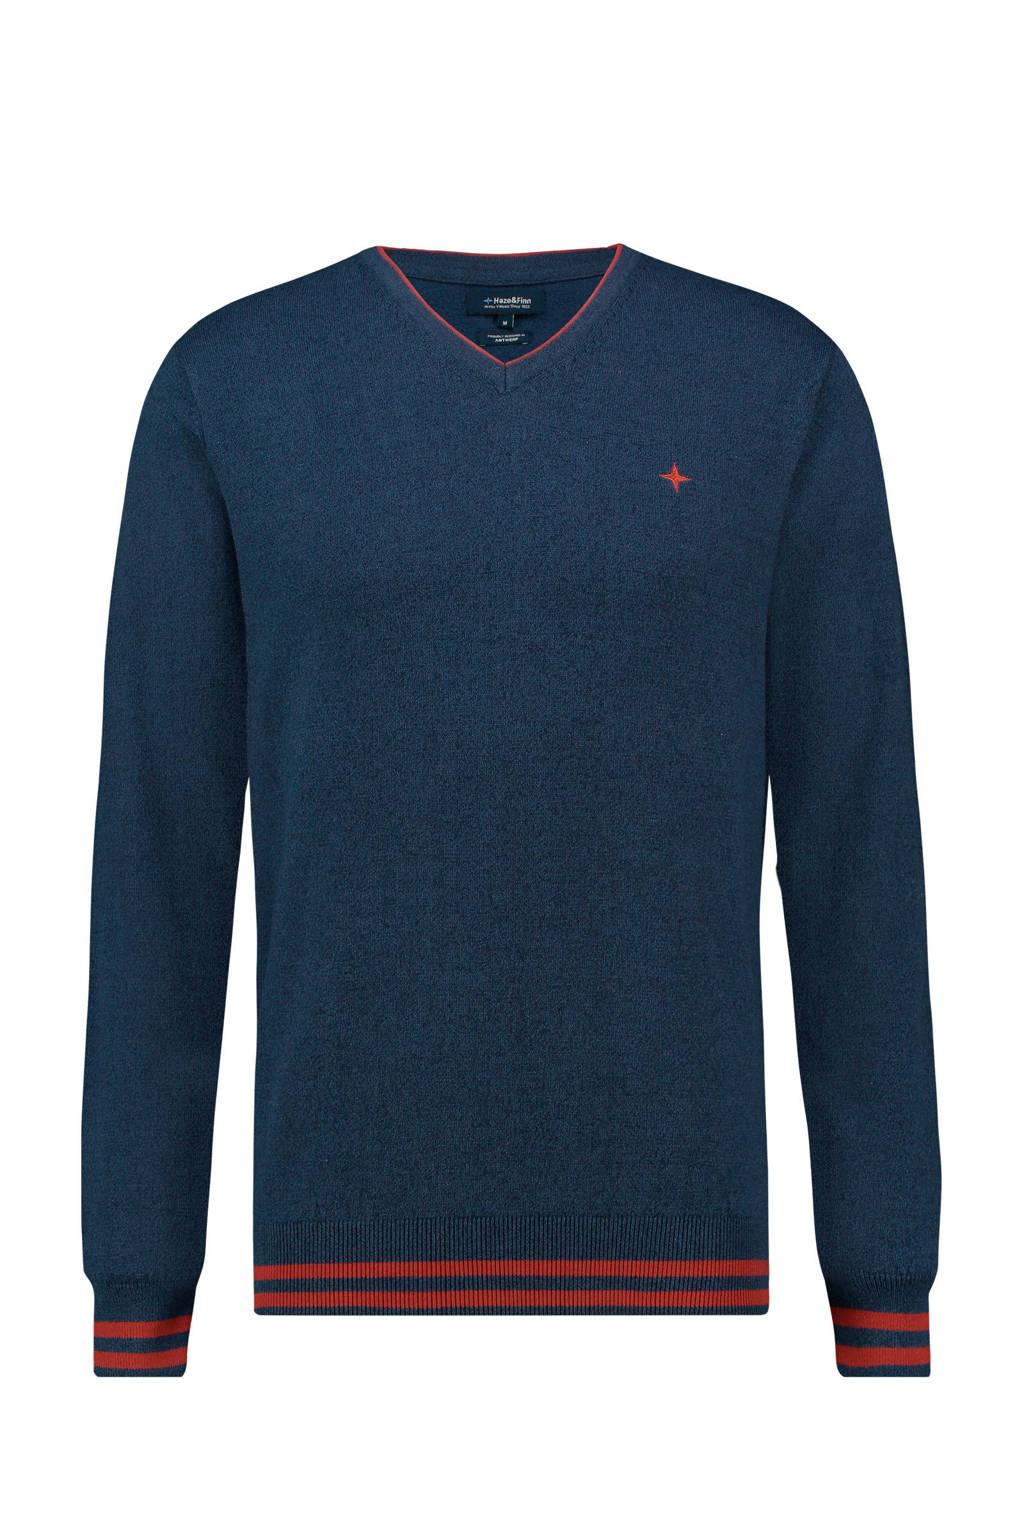 Haze & Finn gemêleerde sweater donkerblauw, Donkerblauw